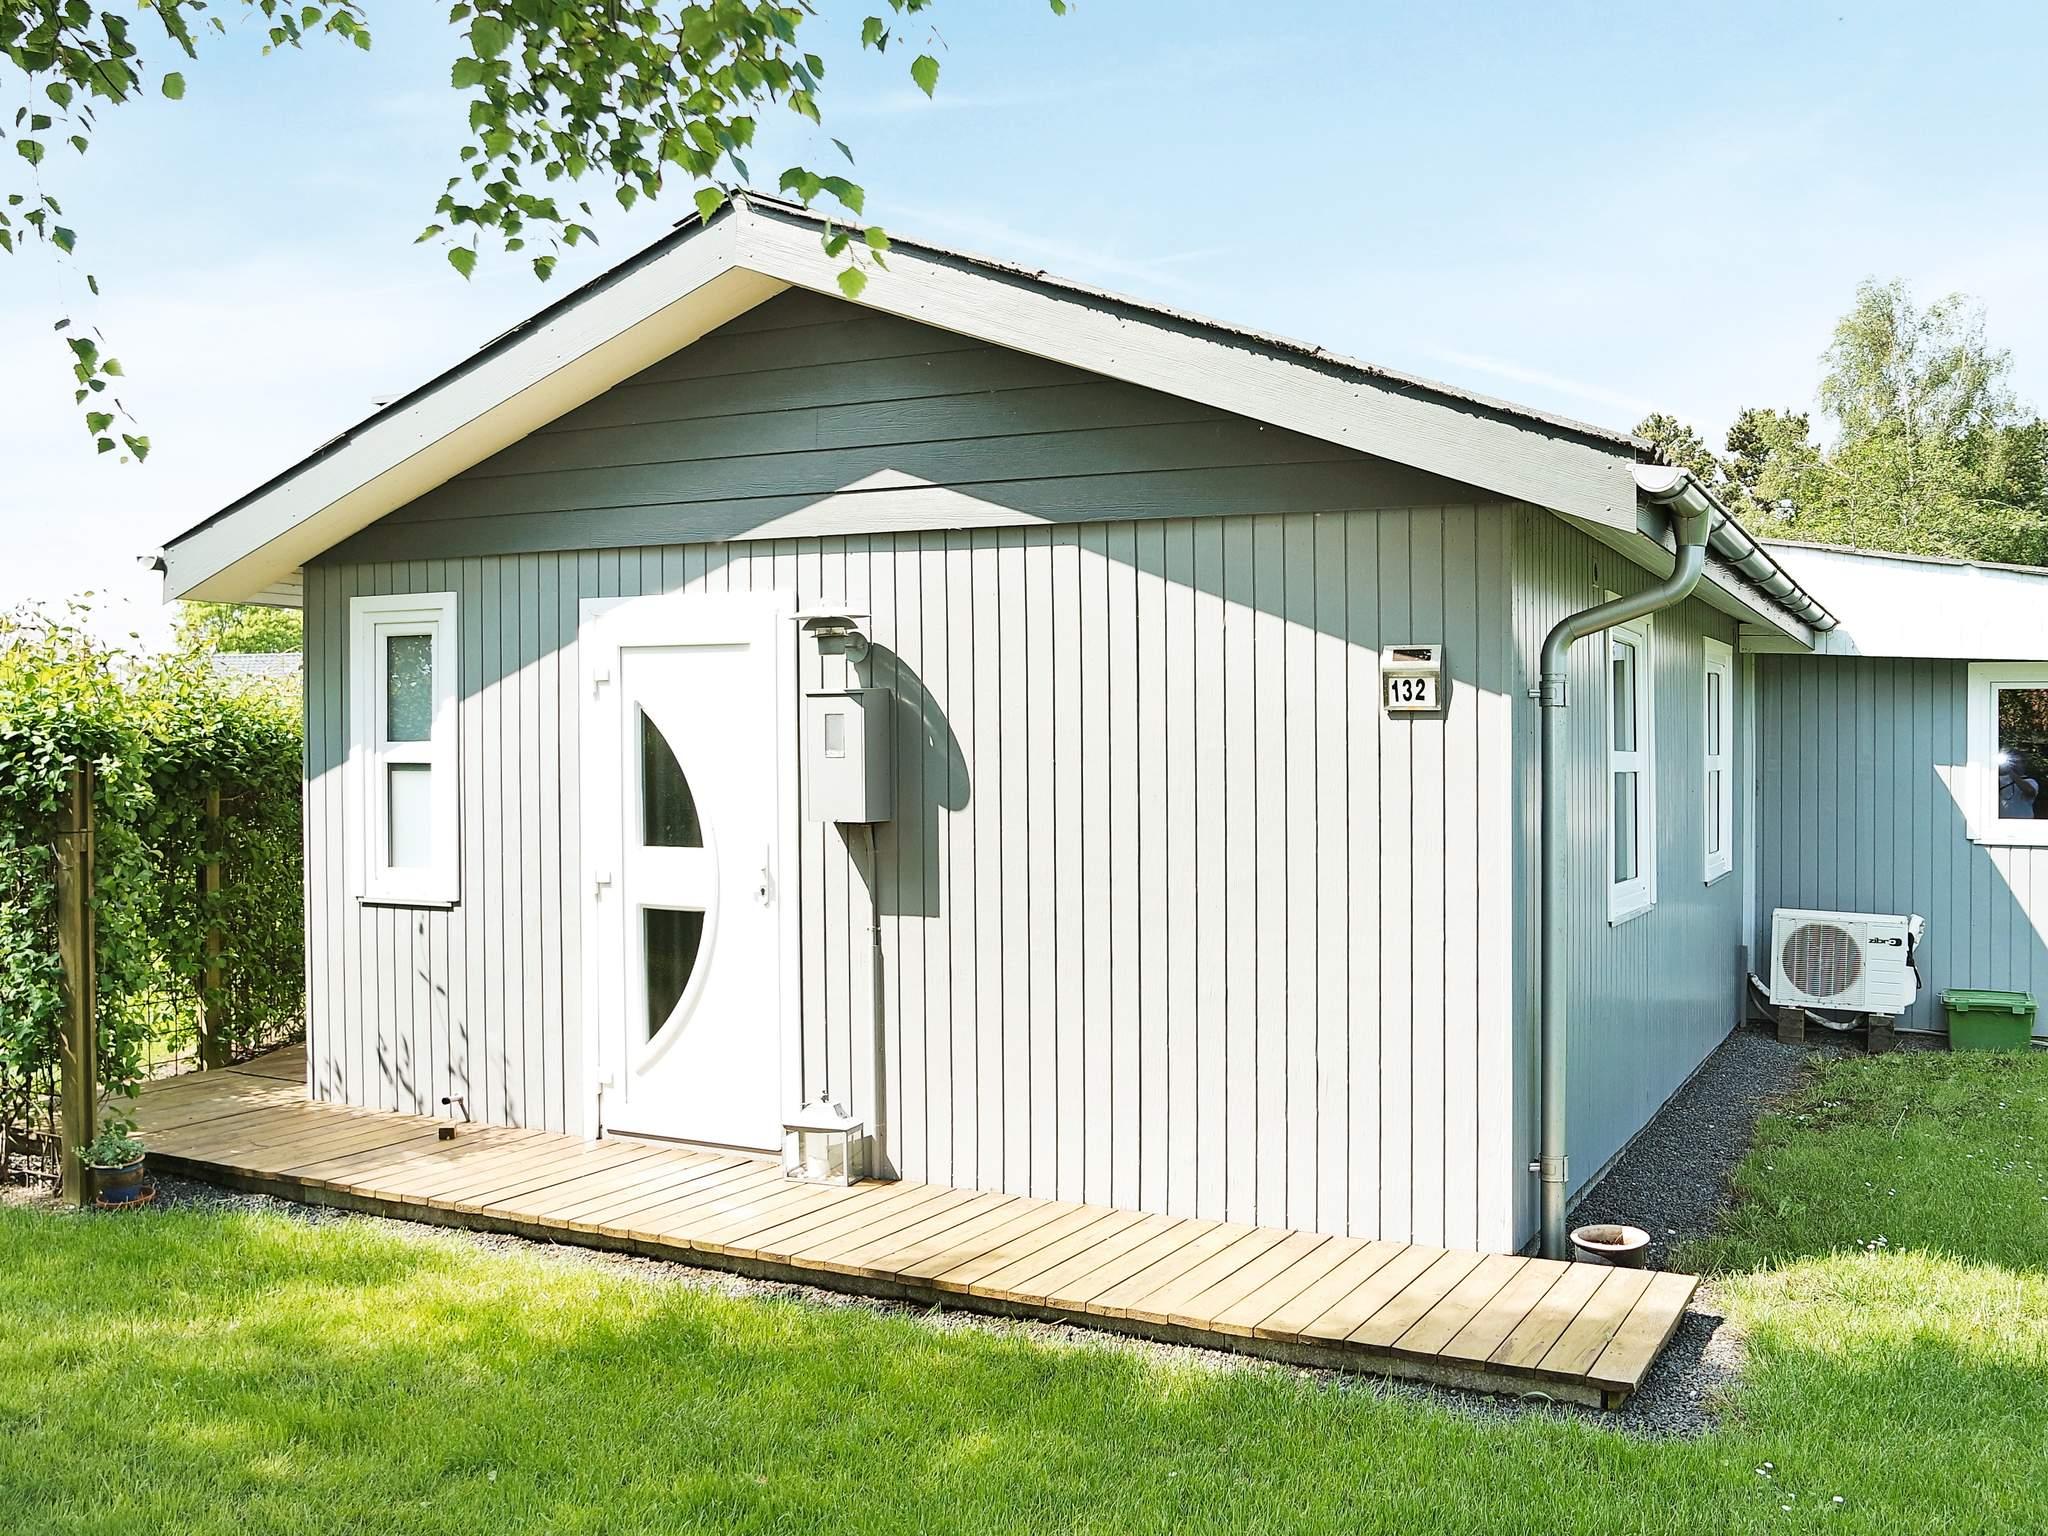 Ferienhaus Øster Hurup (85519), Øster Hurup, , Ostjütland, Dänemark, Bild 2